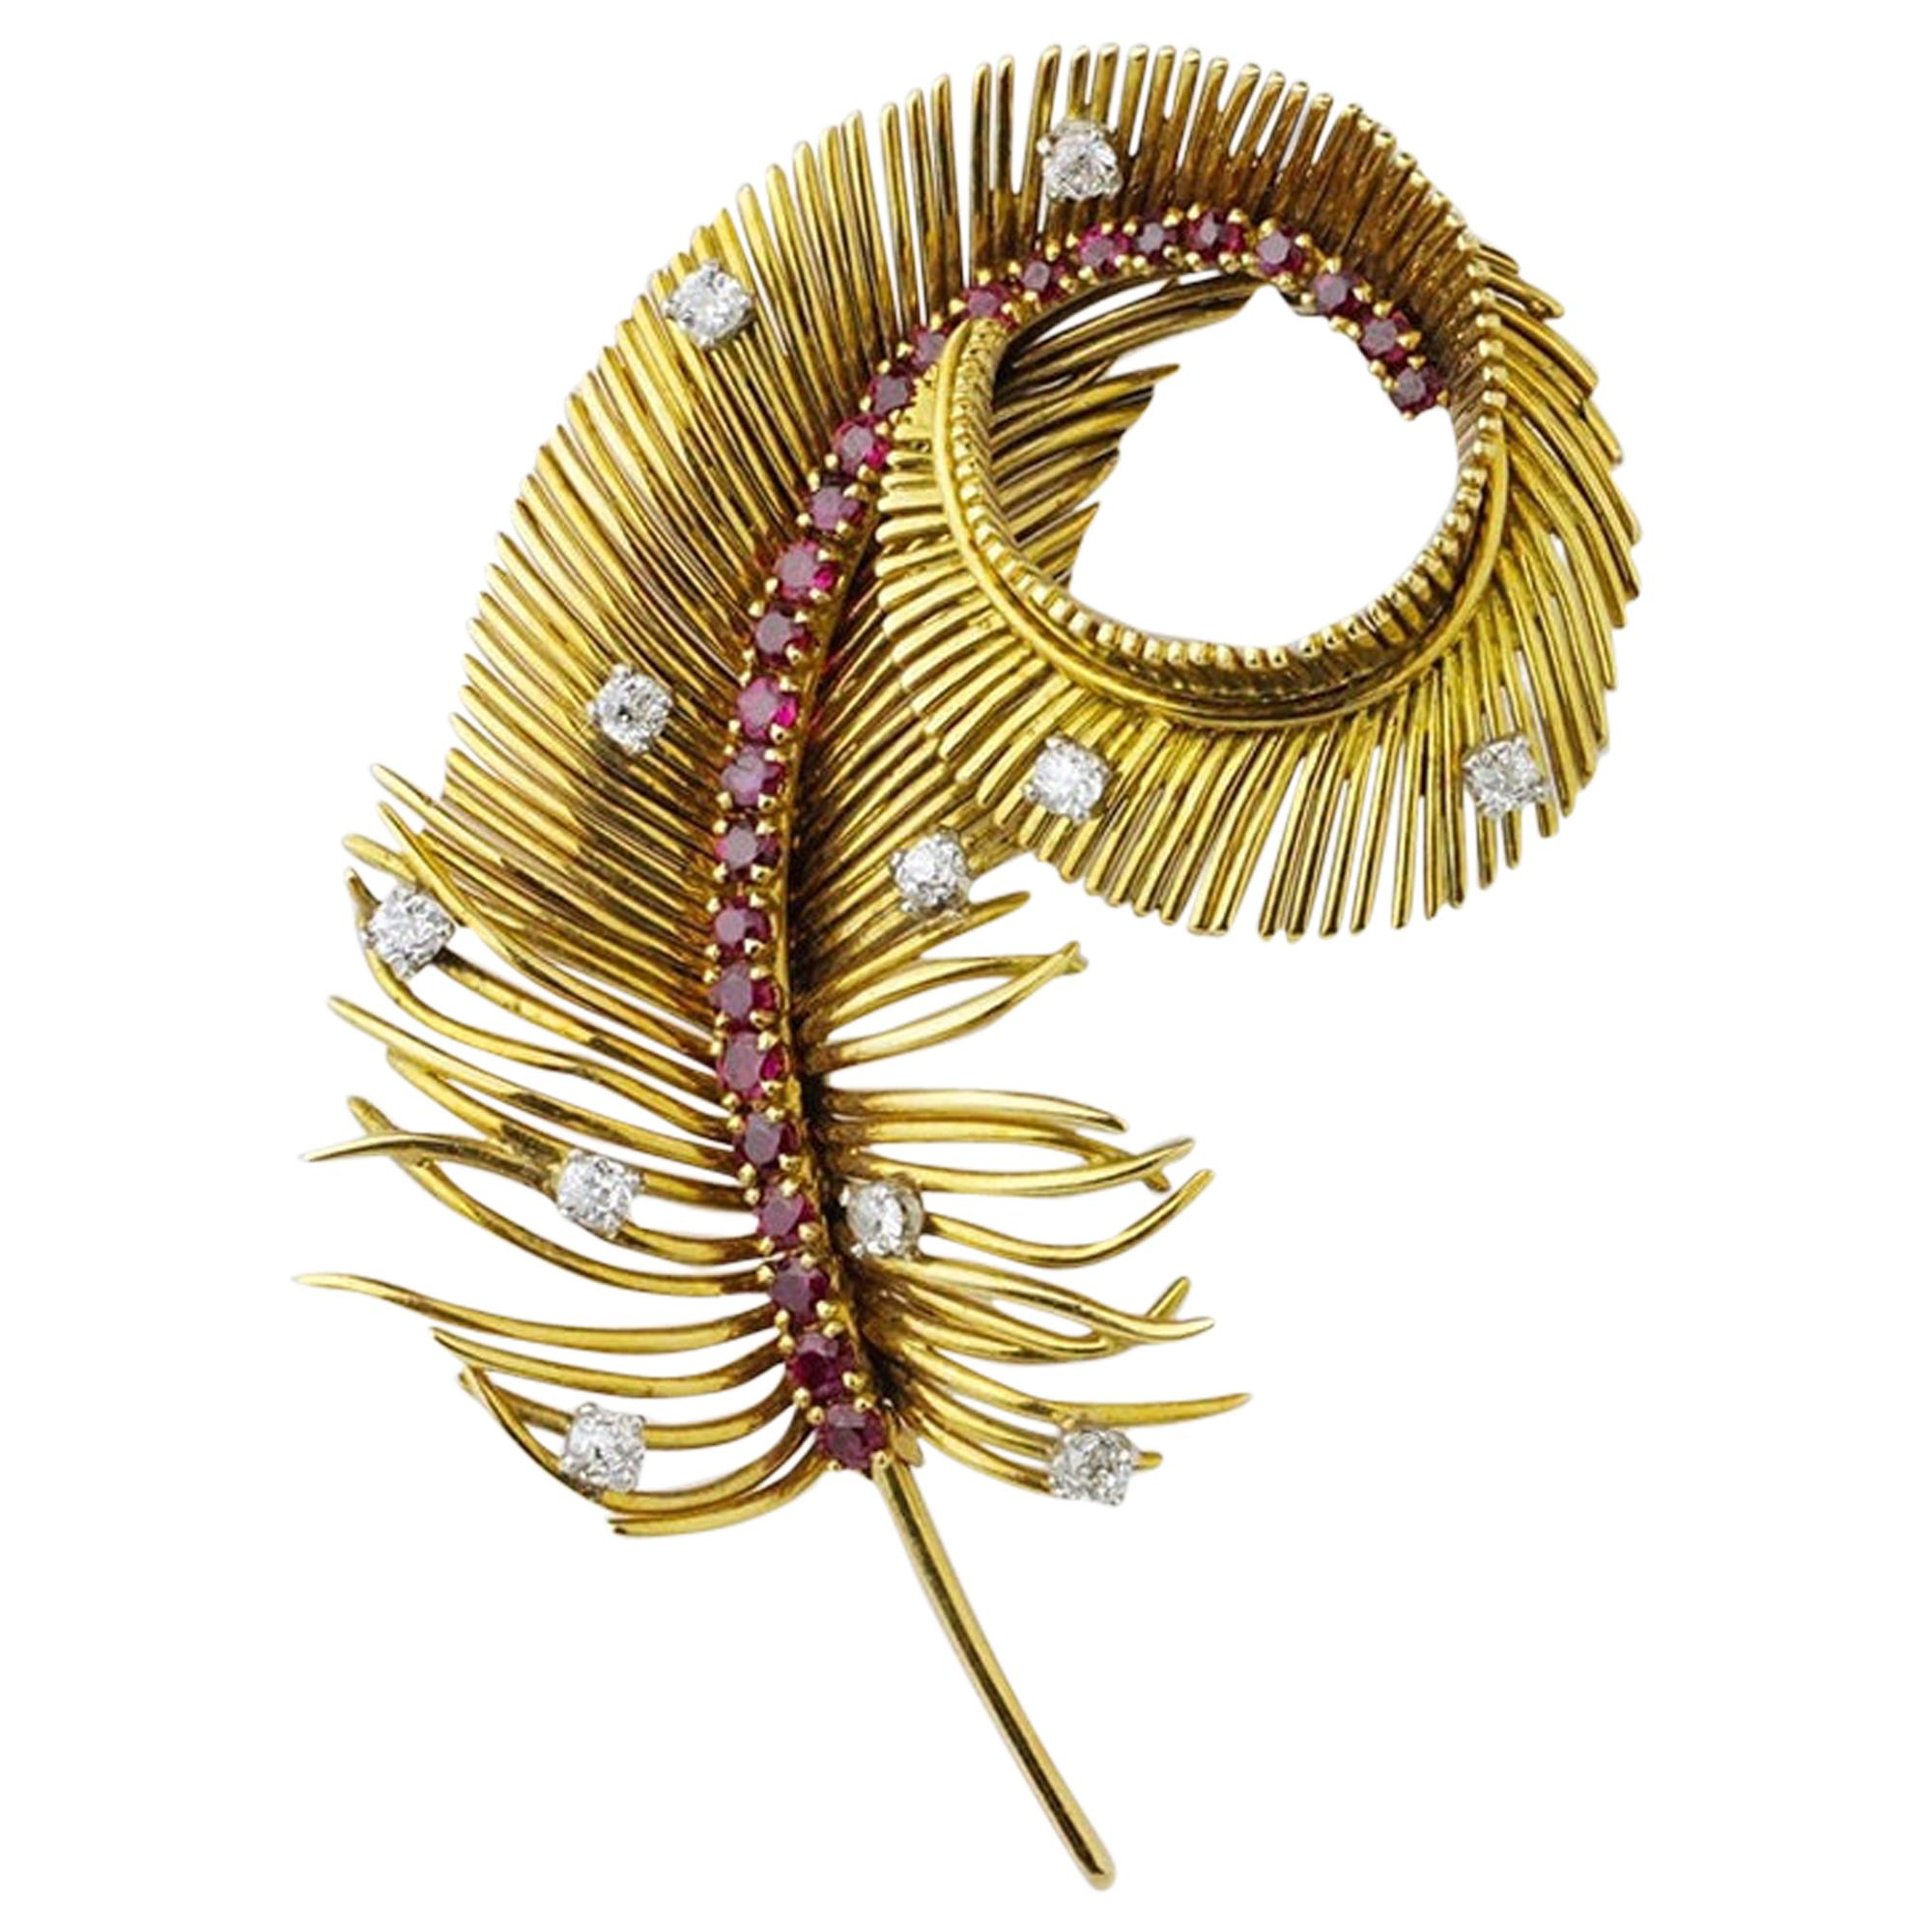 Boucheron 1950s 18 Karat Gold, Diamond and Ruby Feather Brooch Pin